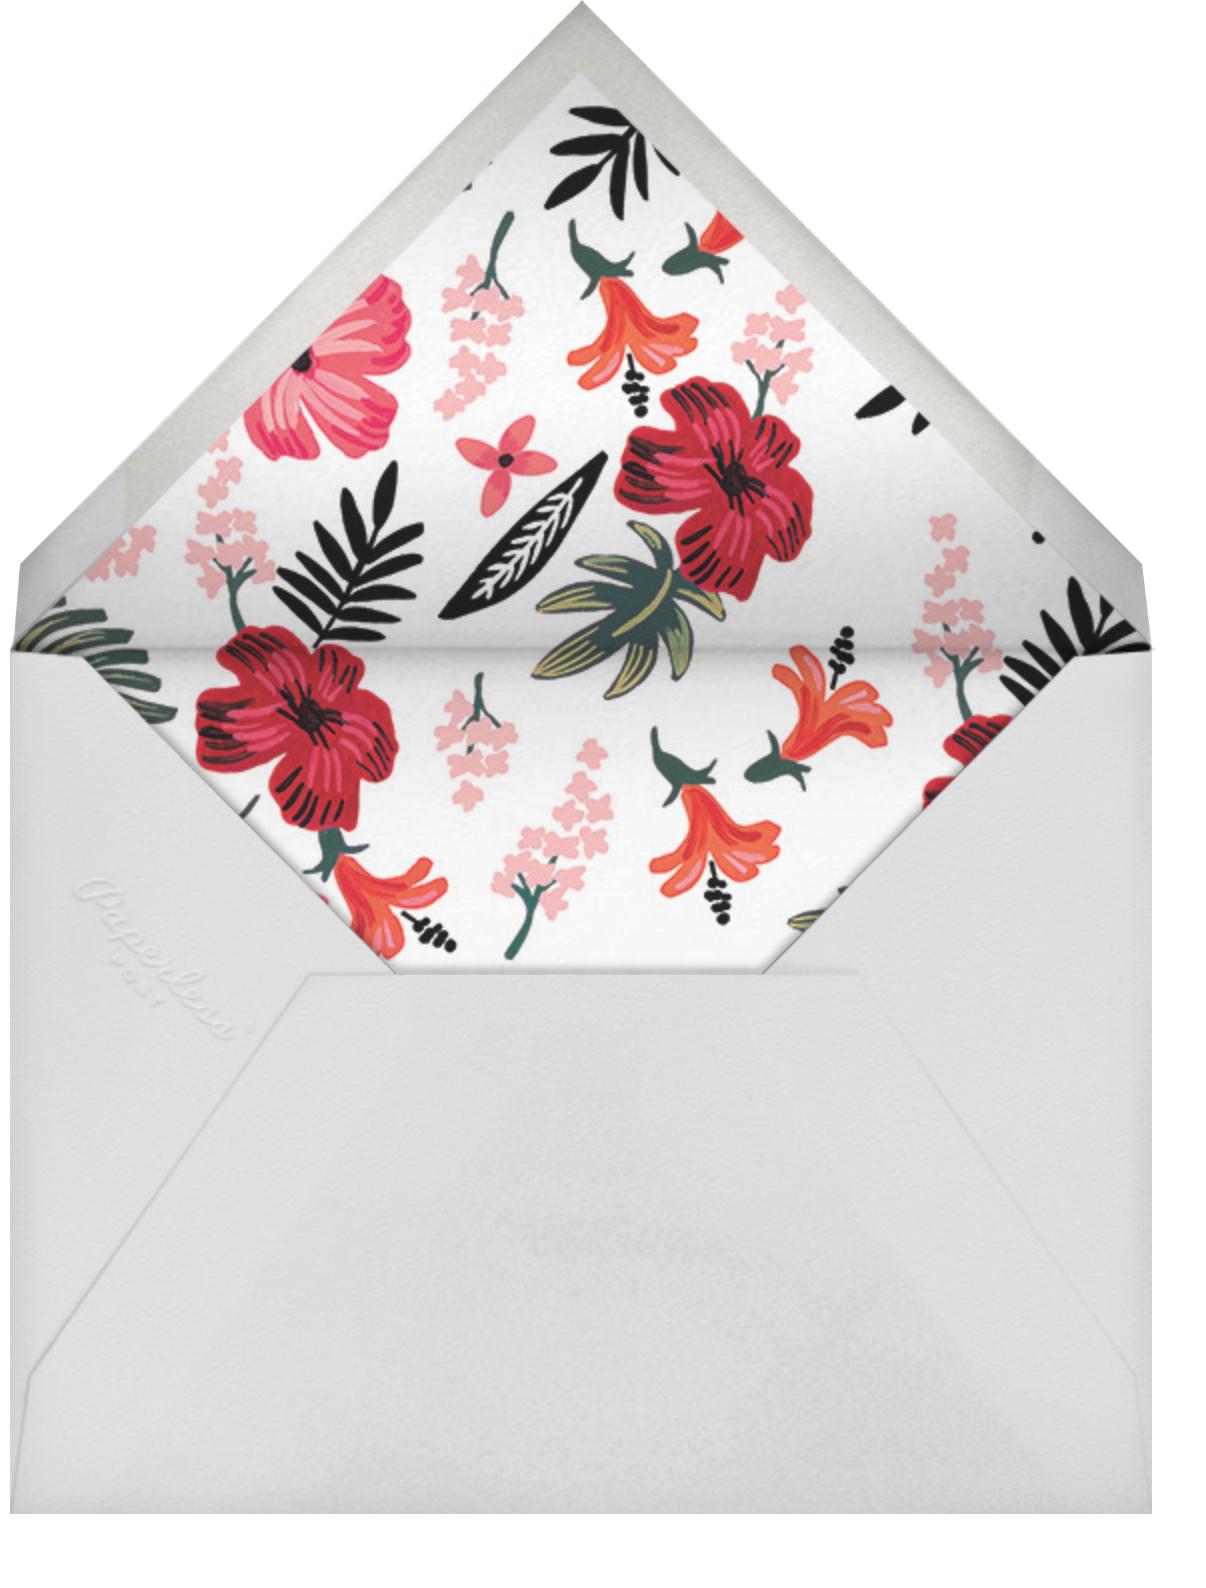 Kona Floral - Pavlova - Rifle Paper Co. - Envelope